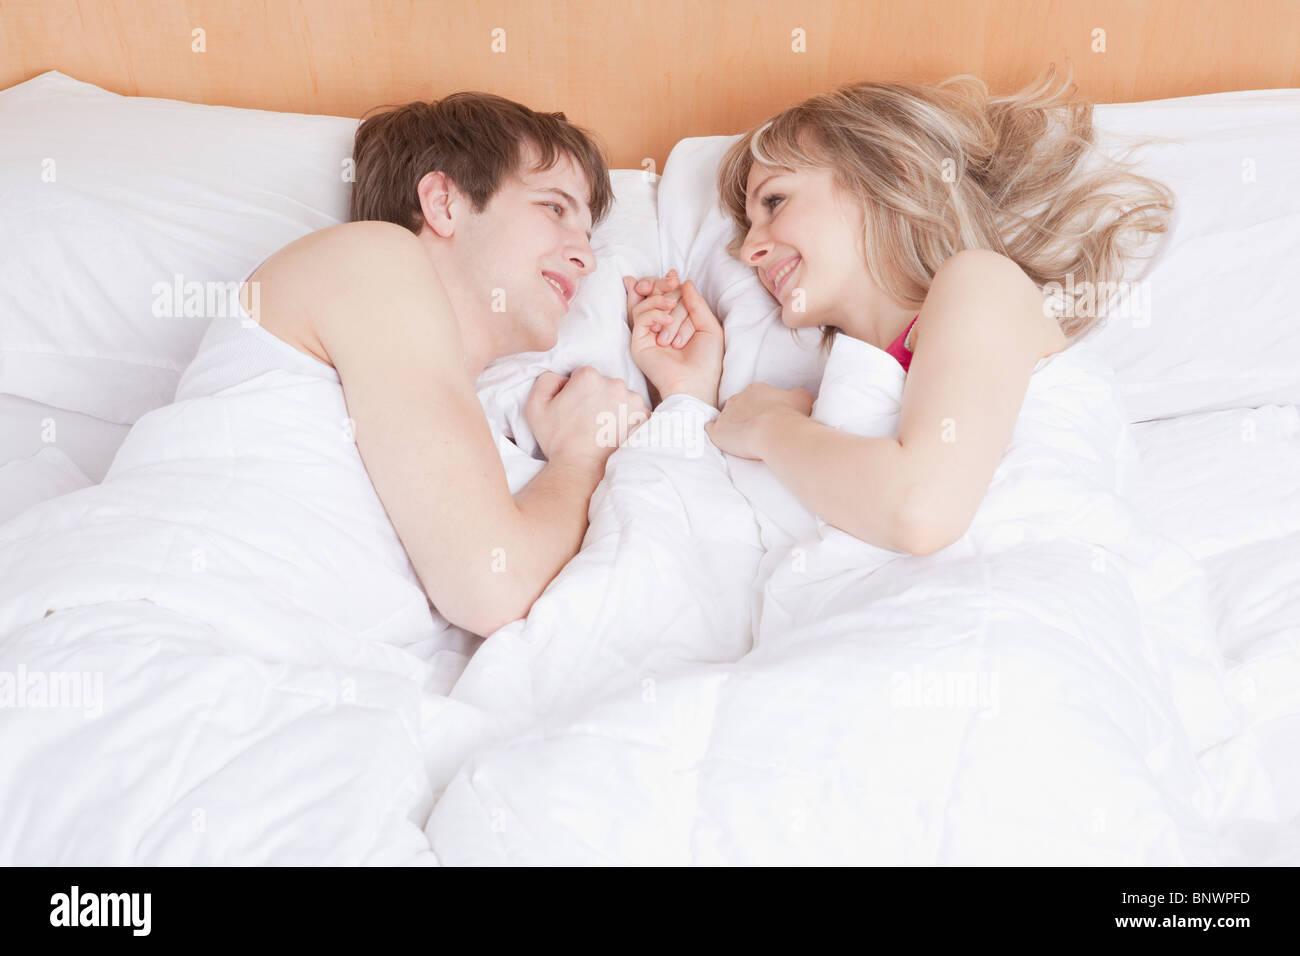 Paar im Bett liegend zusammen Stockbild